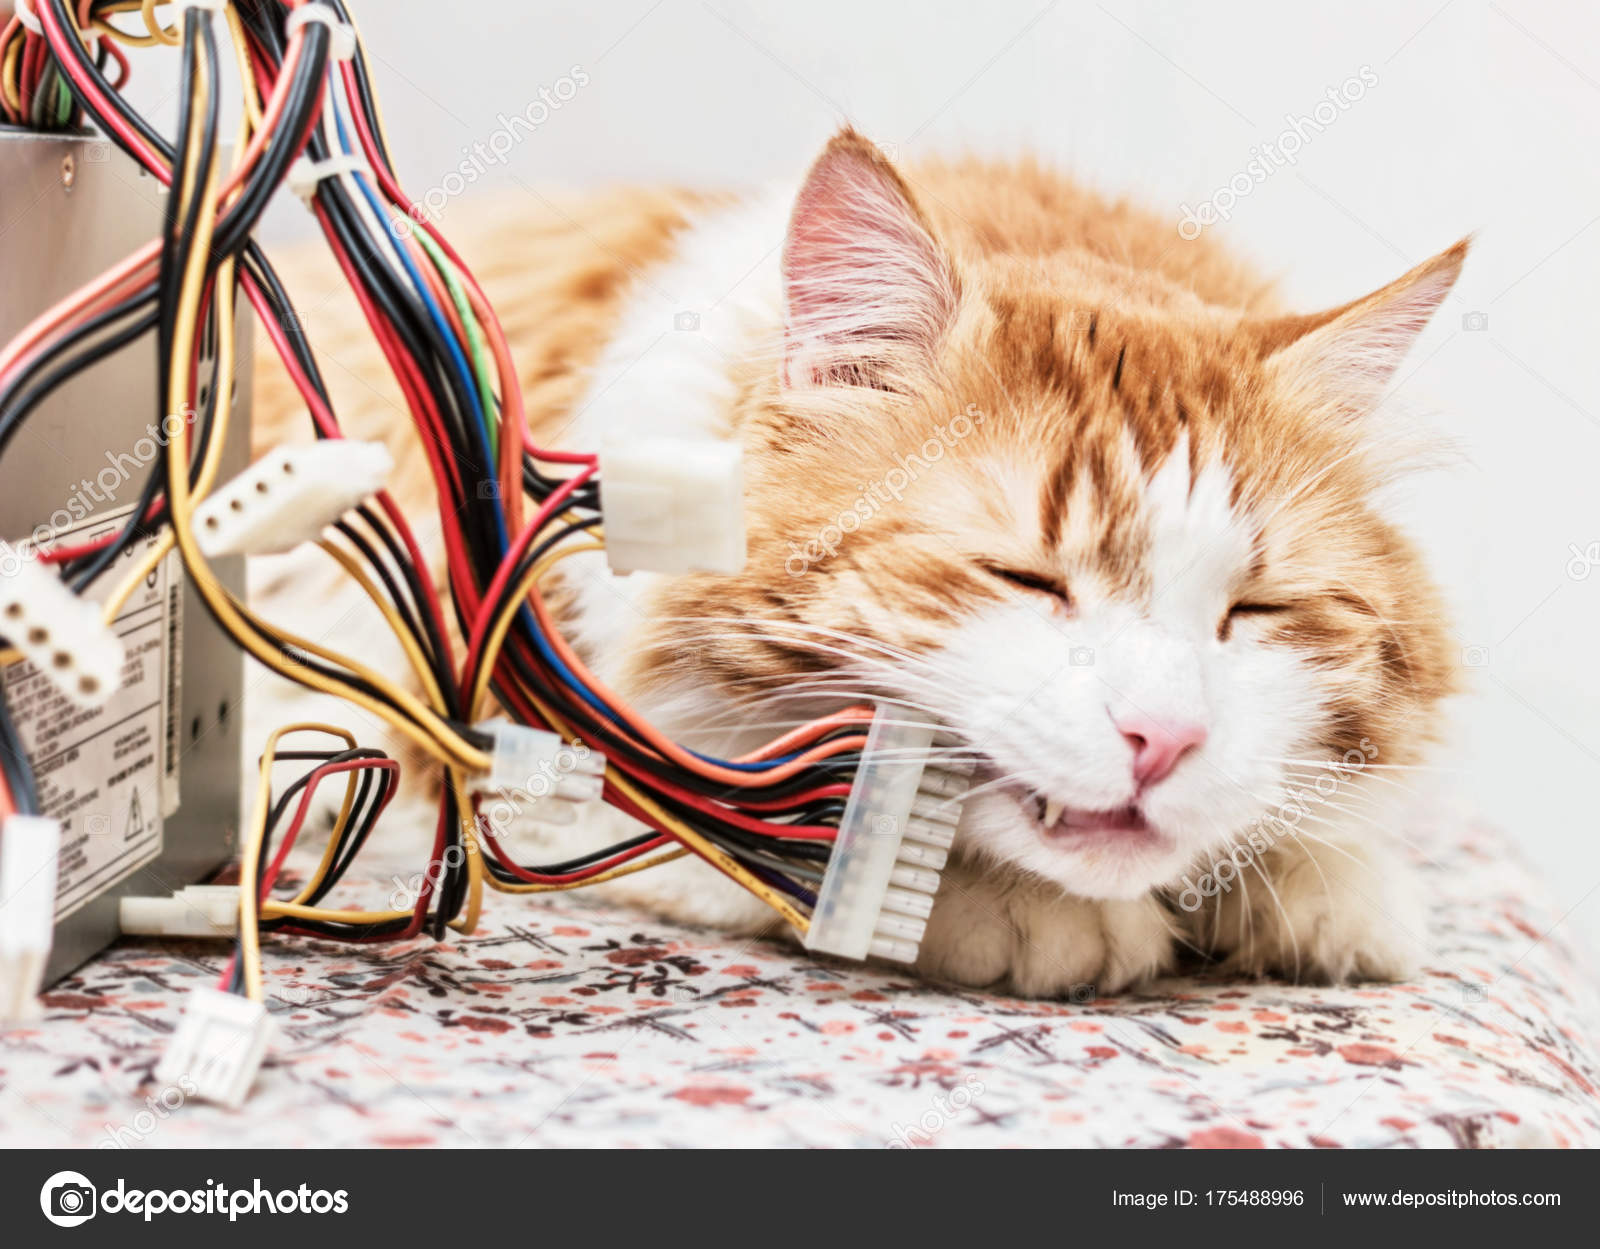 Cat and computer wires — Stock Photo © dashabelozerova #175488996